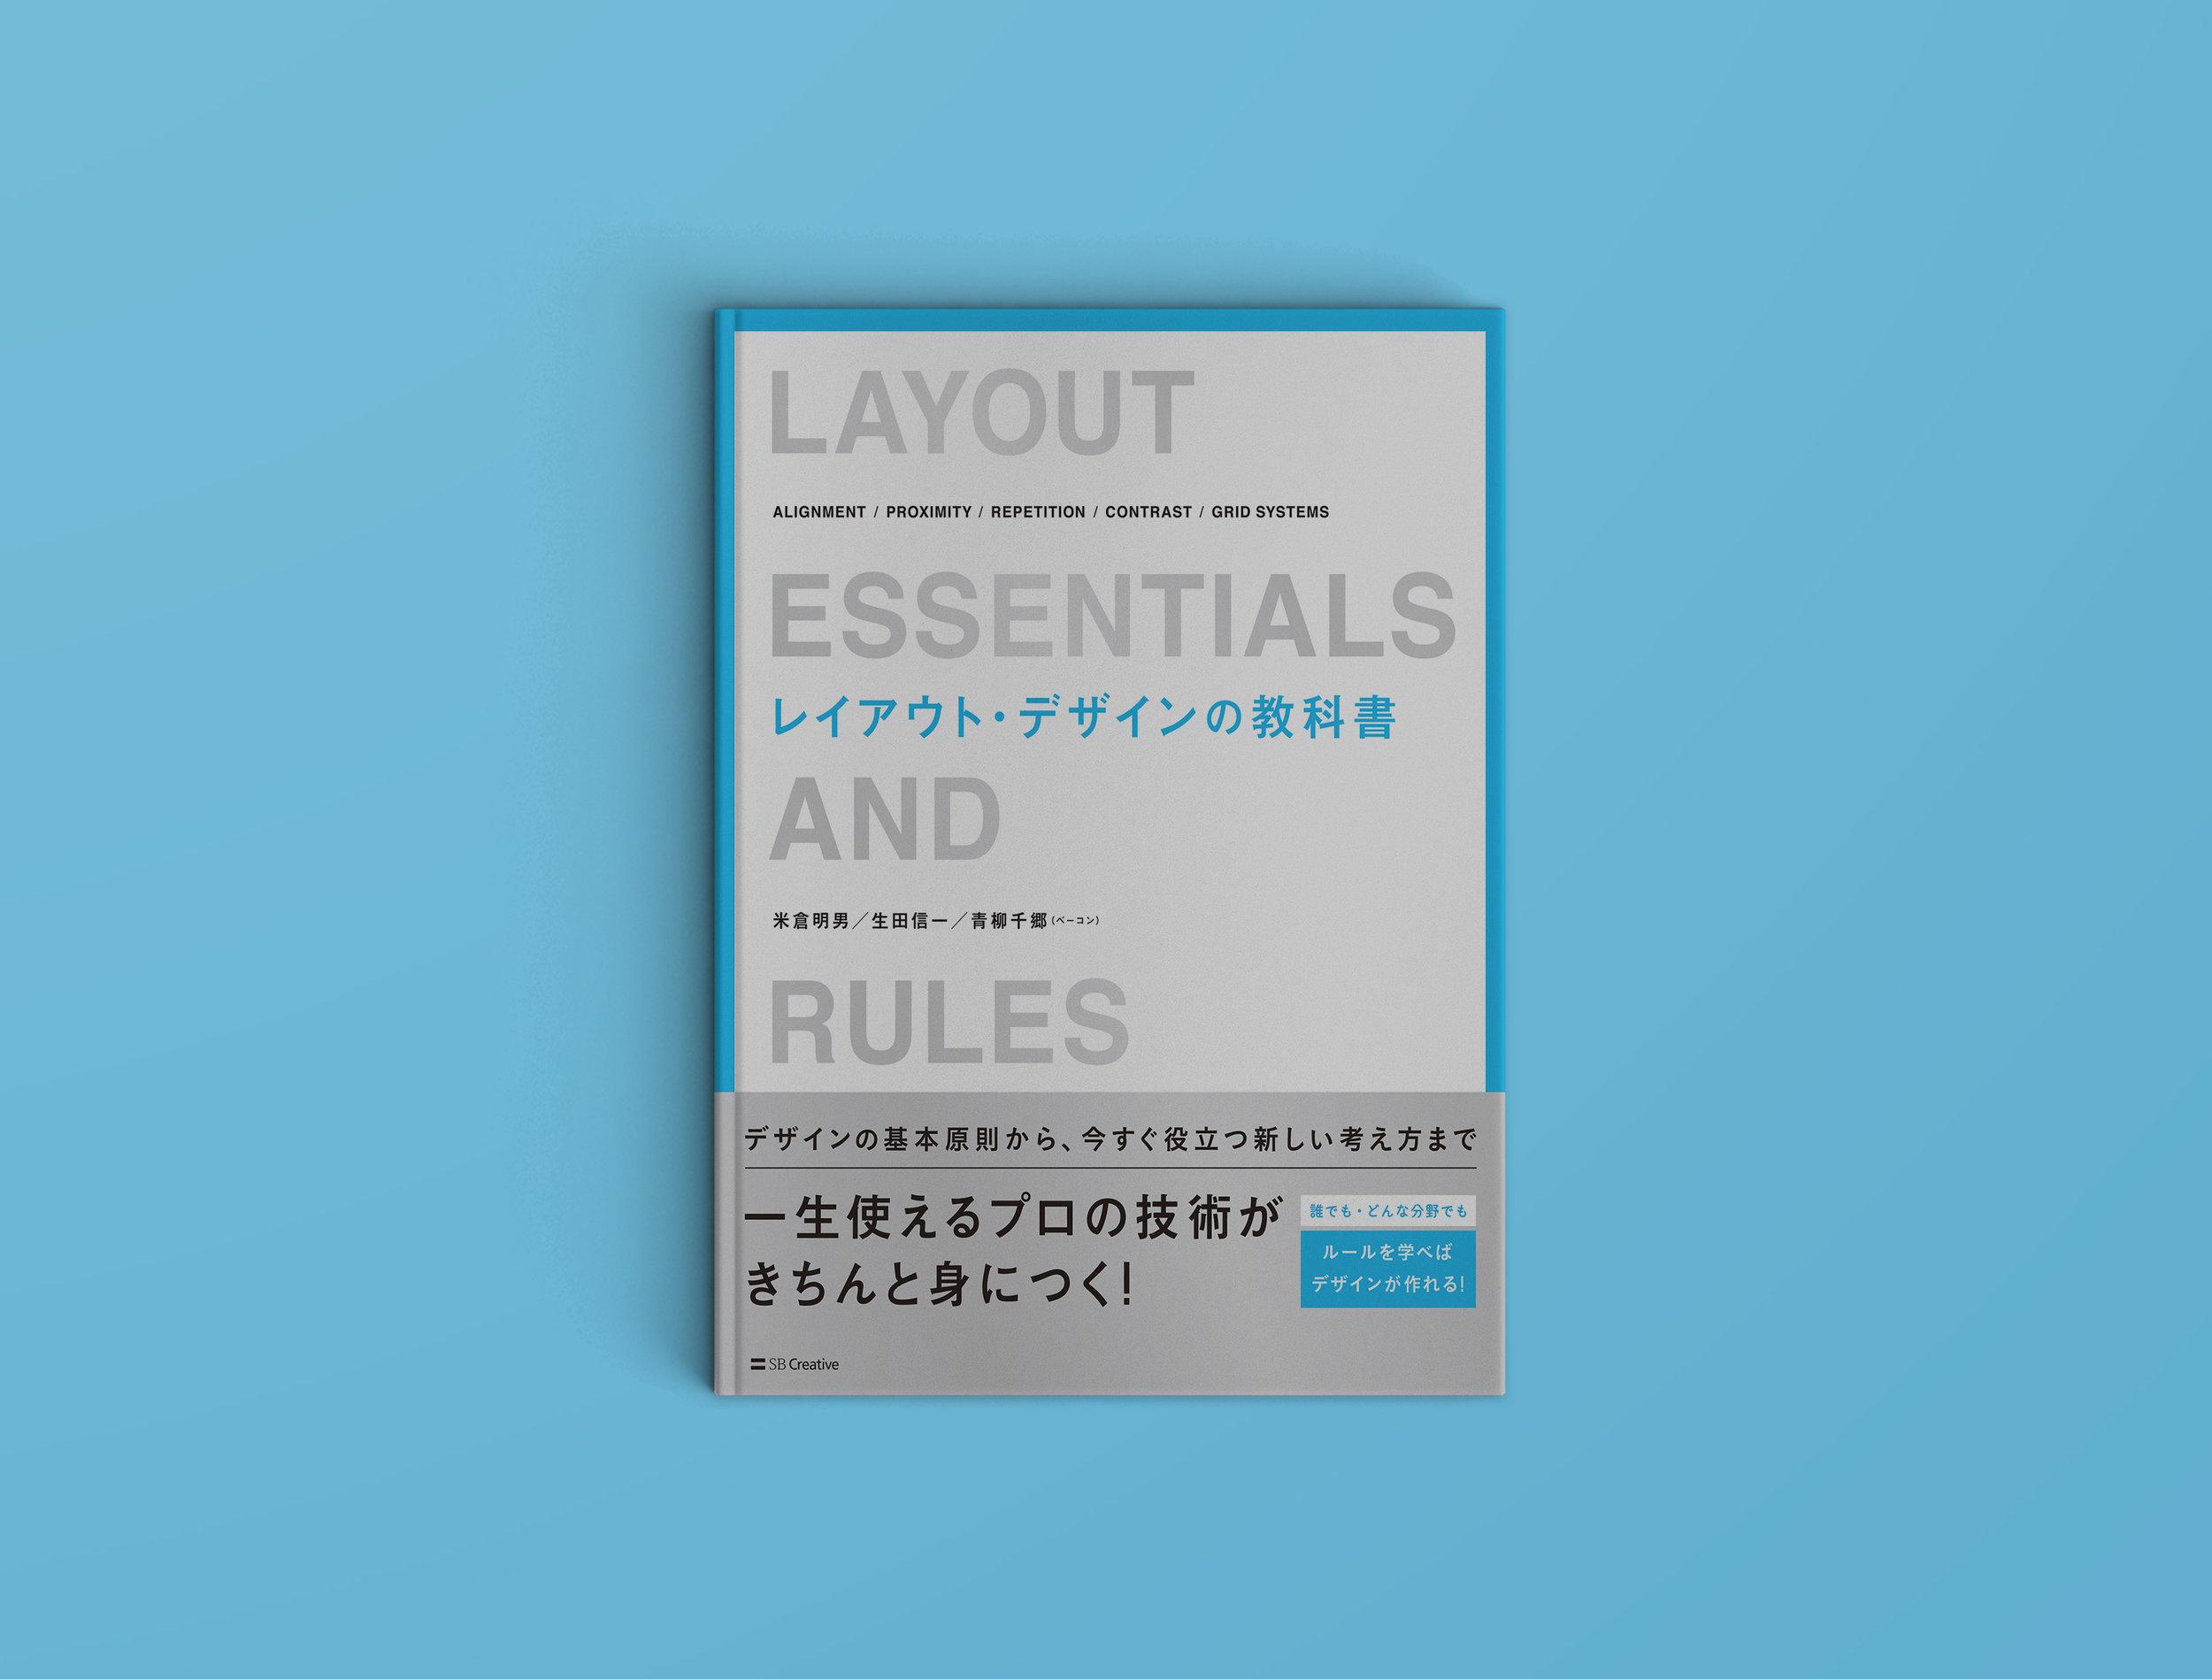 Layout-Essentials-cover-2.jpg